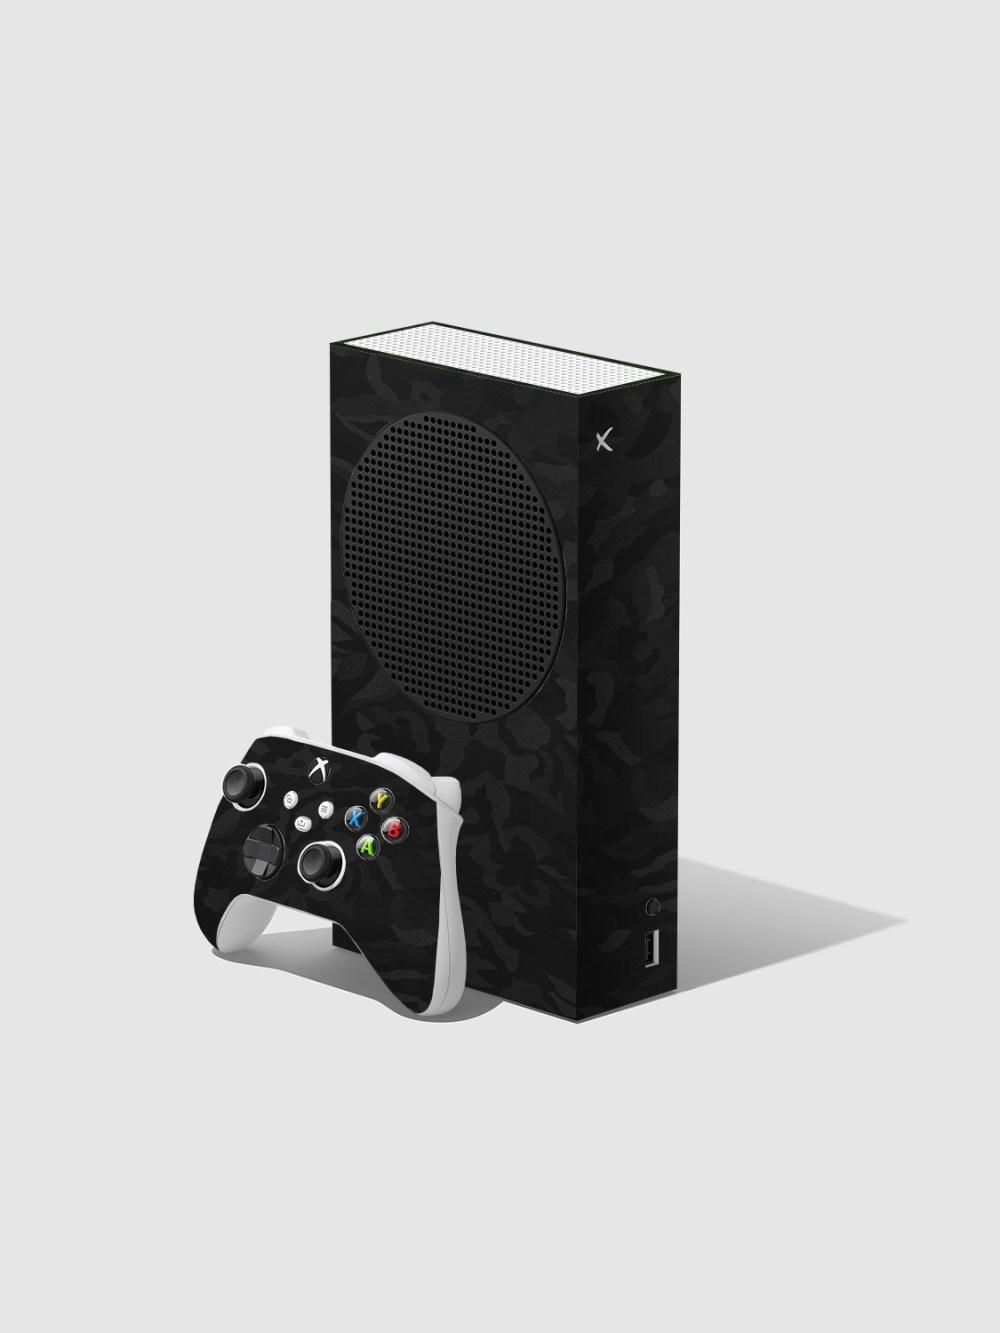 Black Camo Xbox Series S Console and Controller Skin Wrap